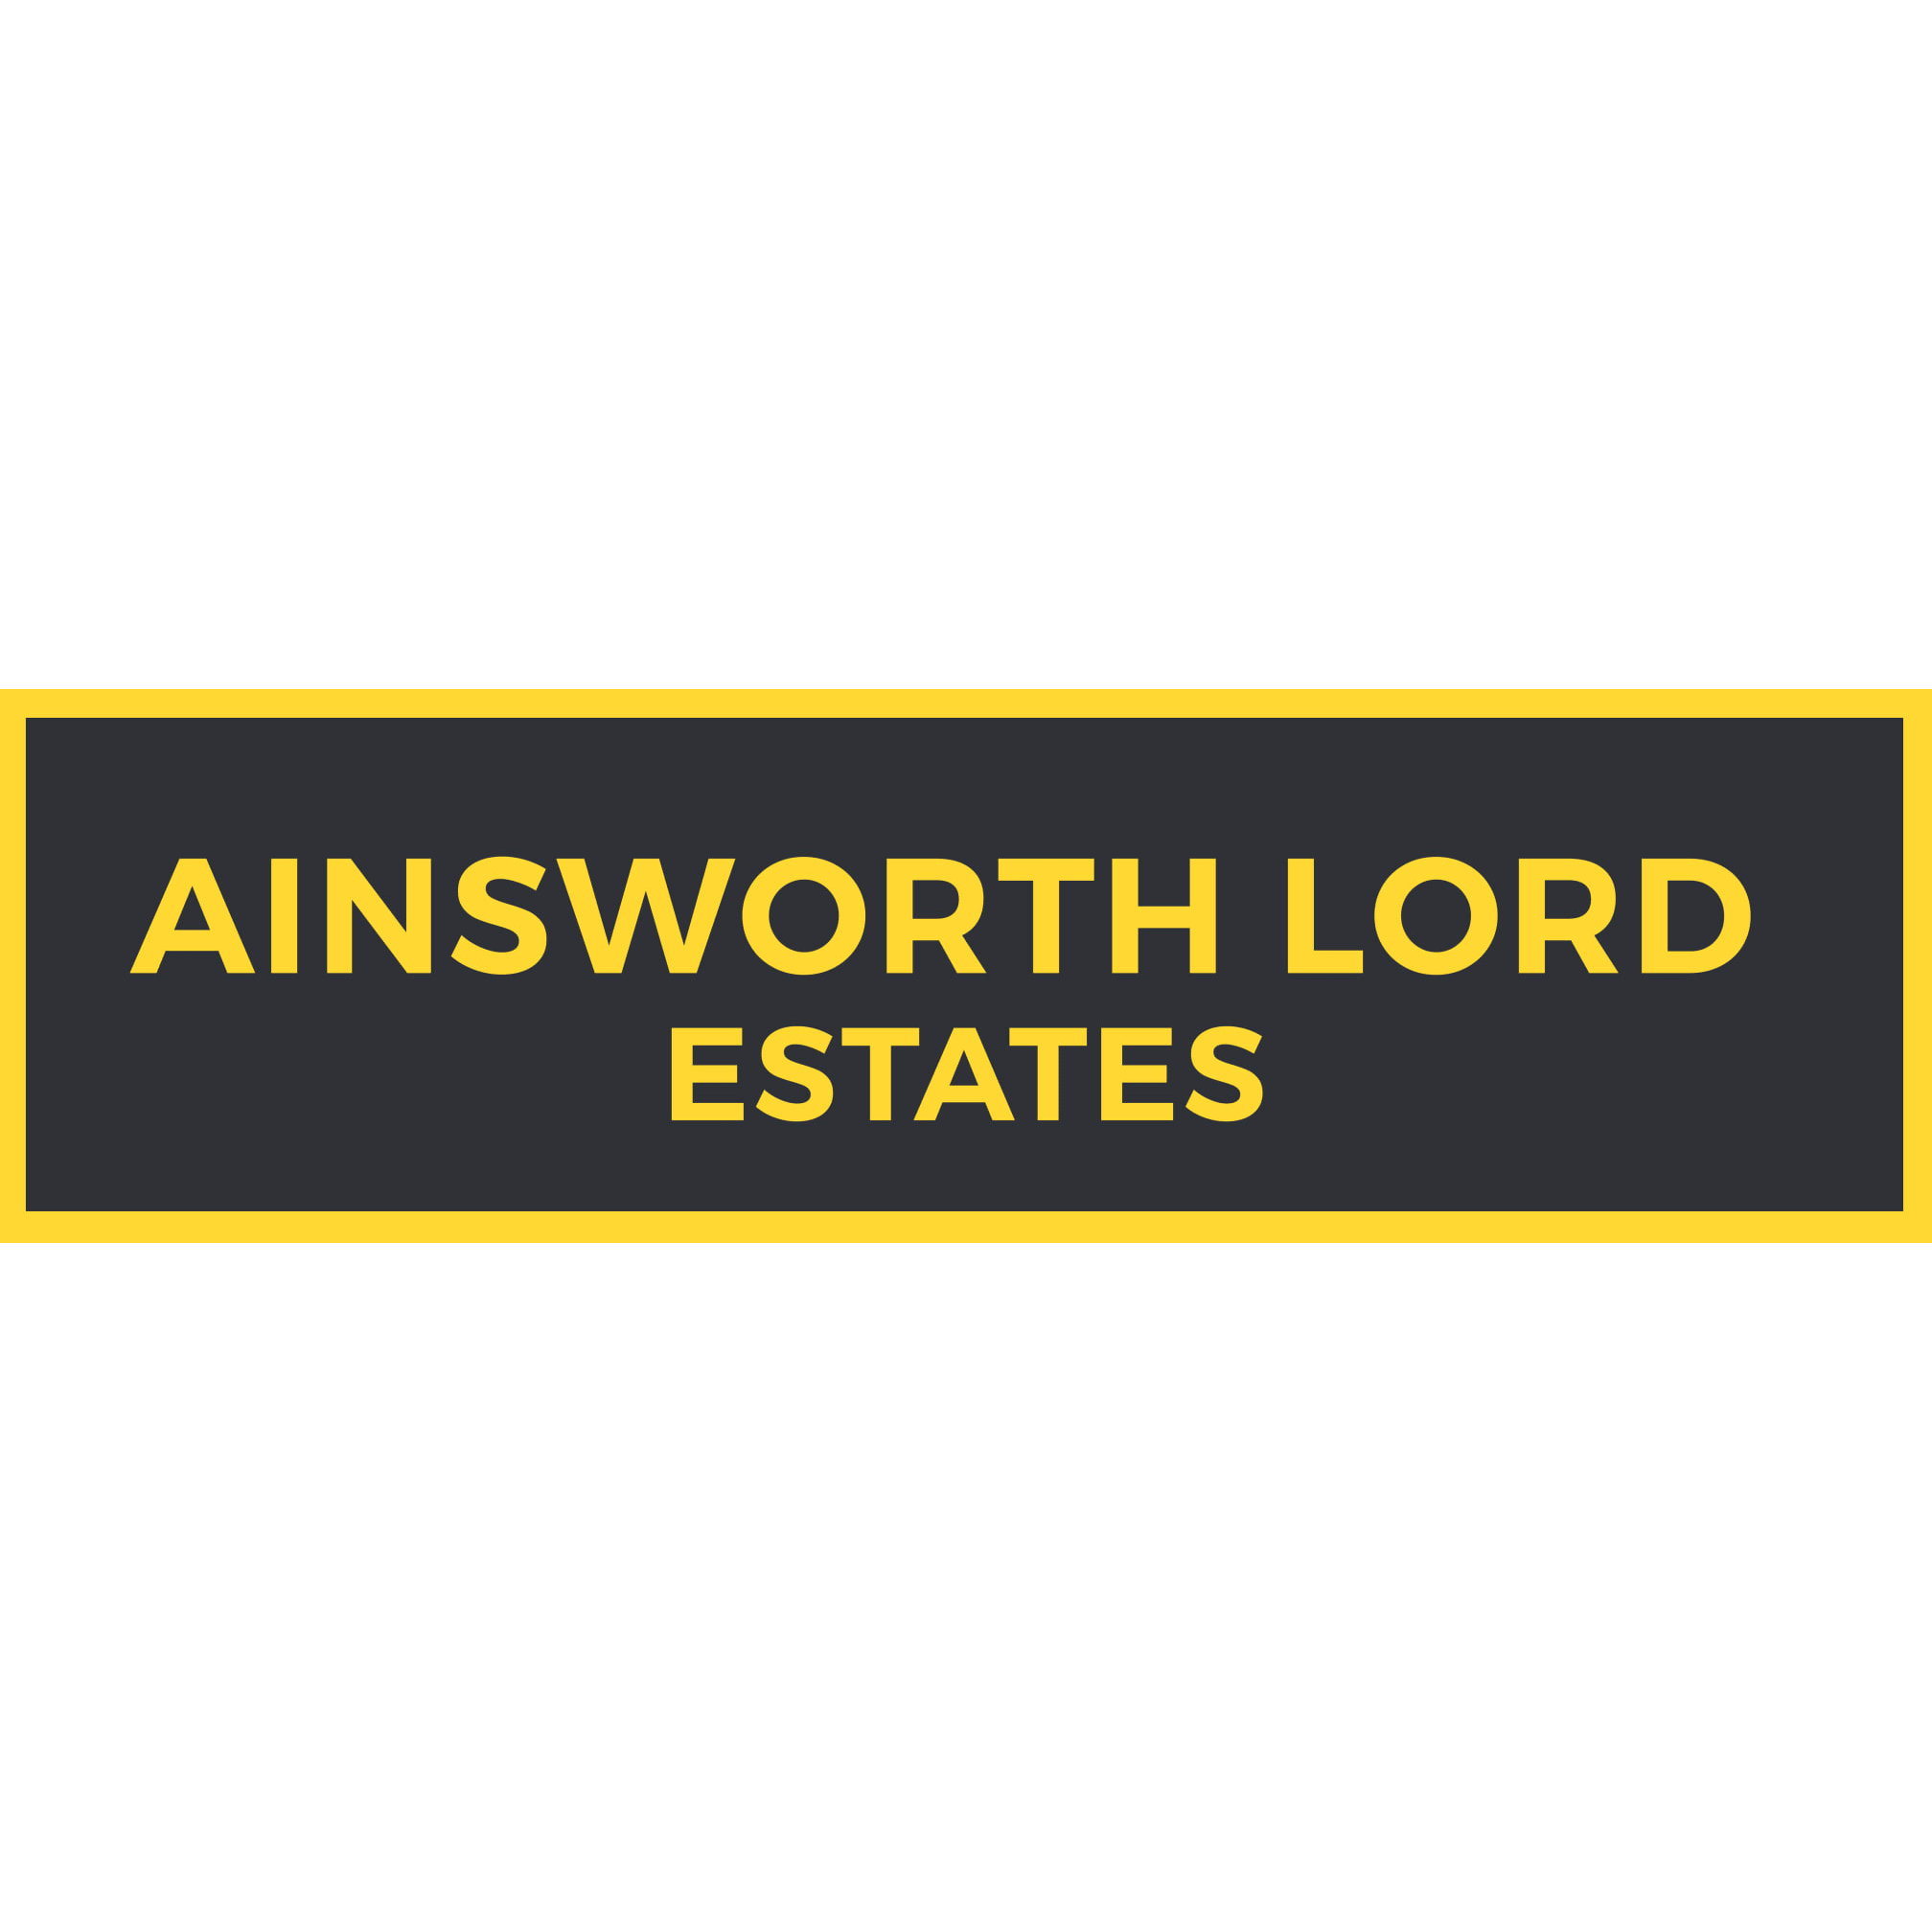 Ainsworth Lord Estates - Darwen, Lancashire BB3 1PS - 01254 760660 | ShowMeLocal.com